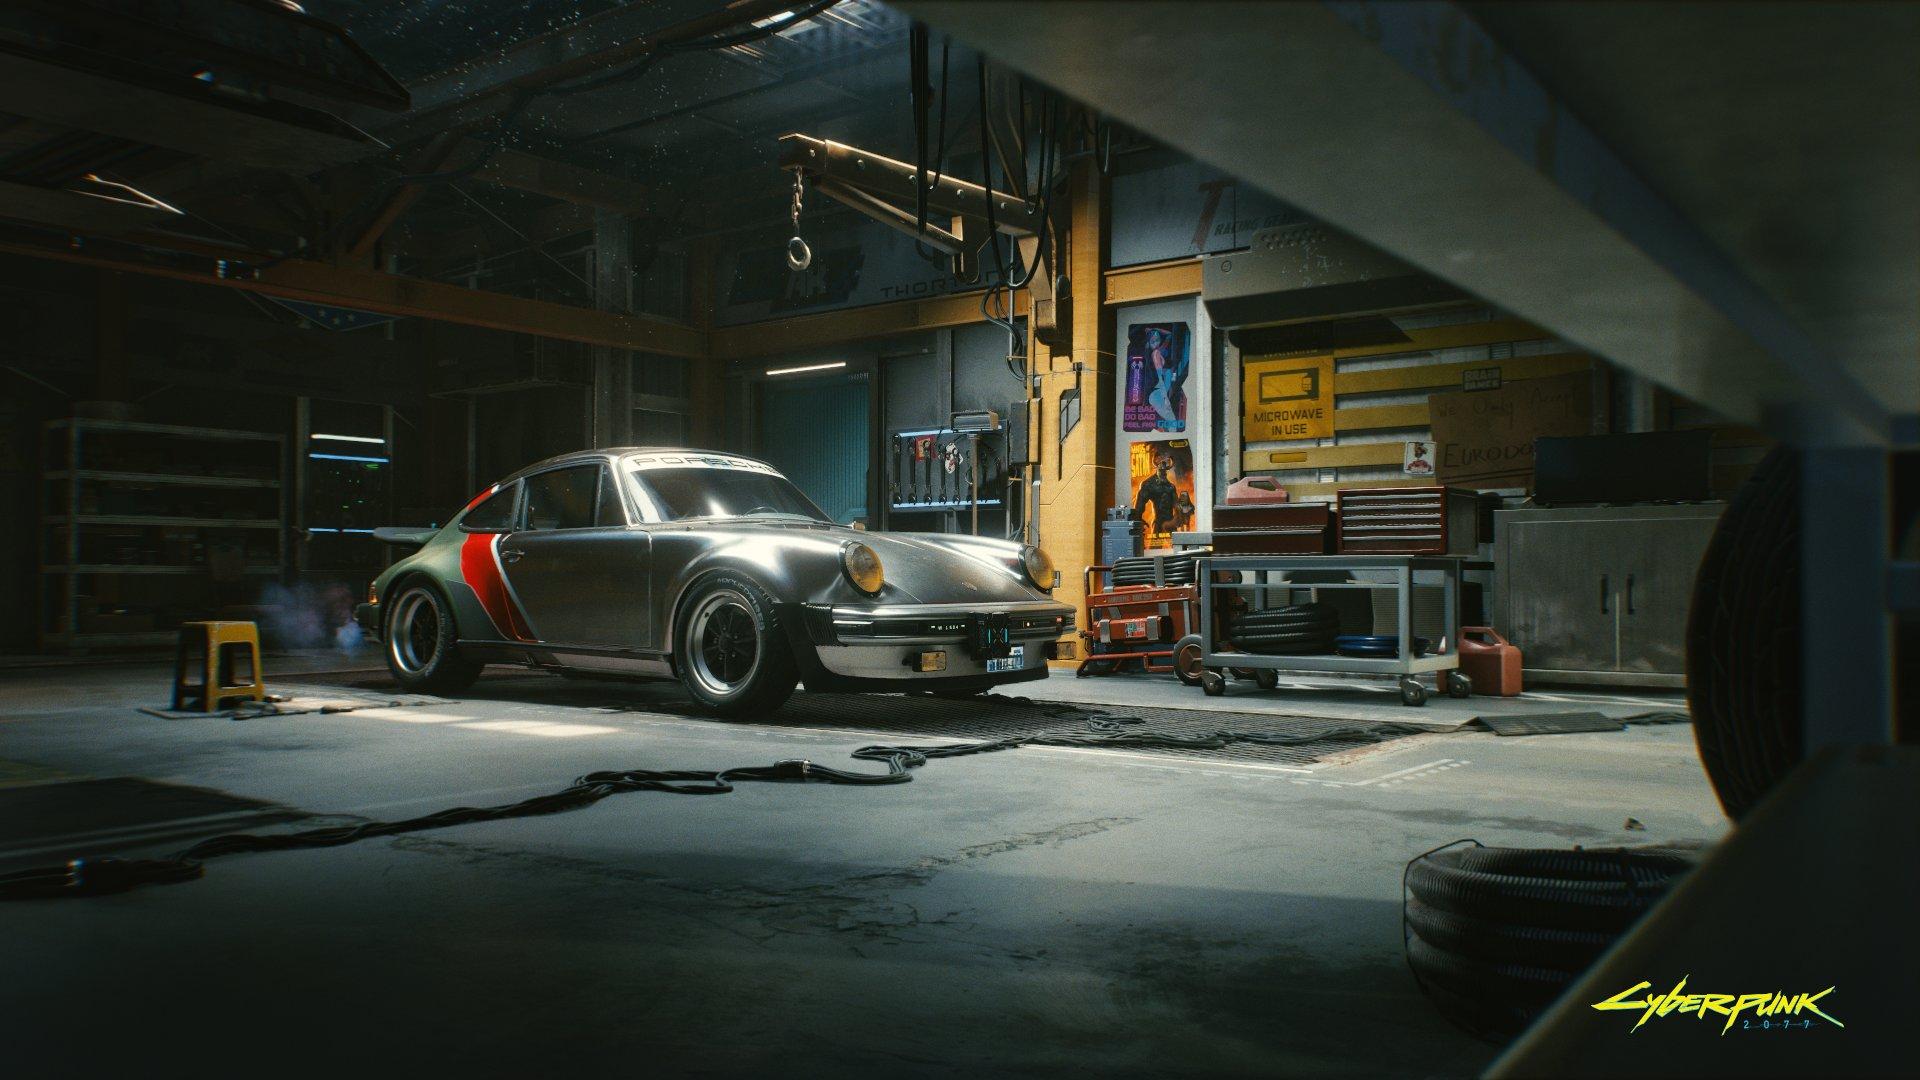 Porsche เร่งเครื่องสู่อนาคตอันมืดมนแห่ง Cyberpunk 2077